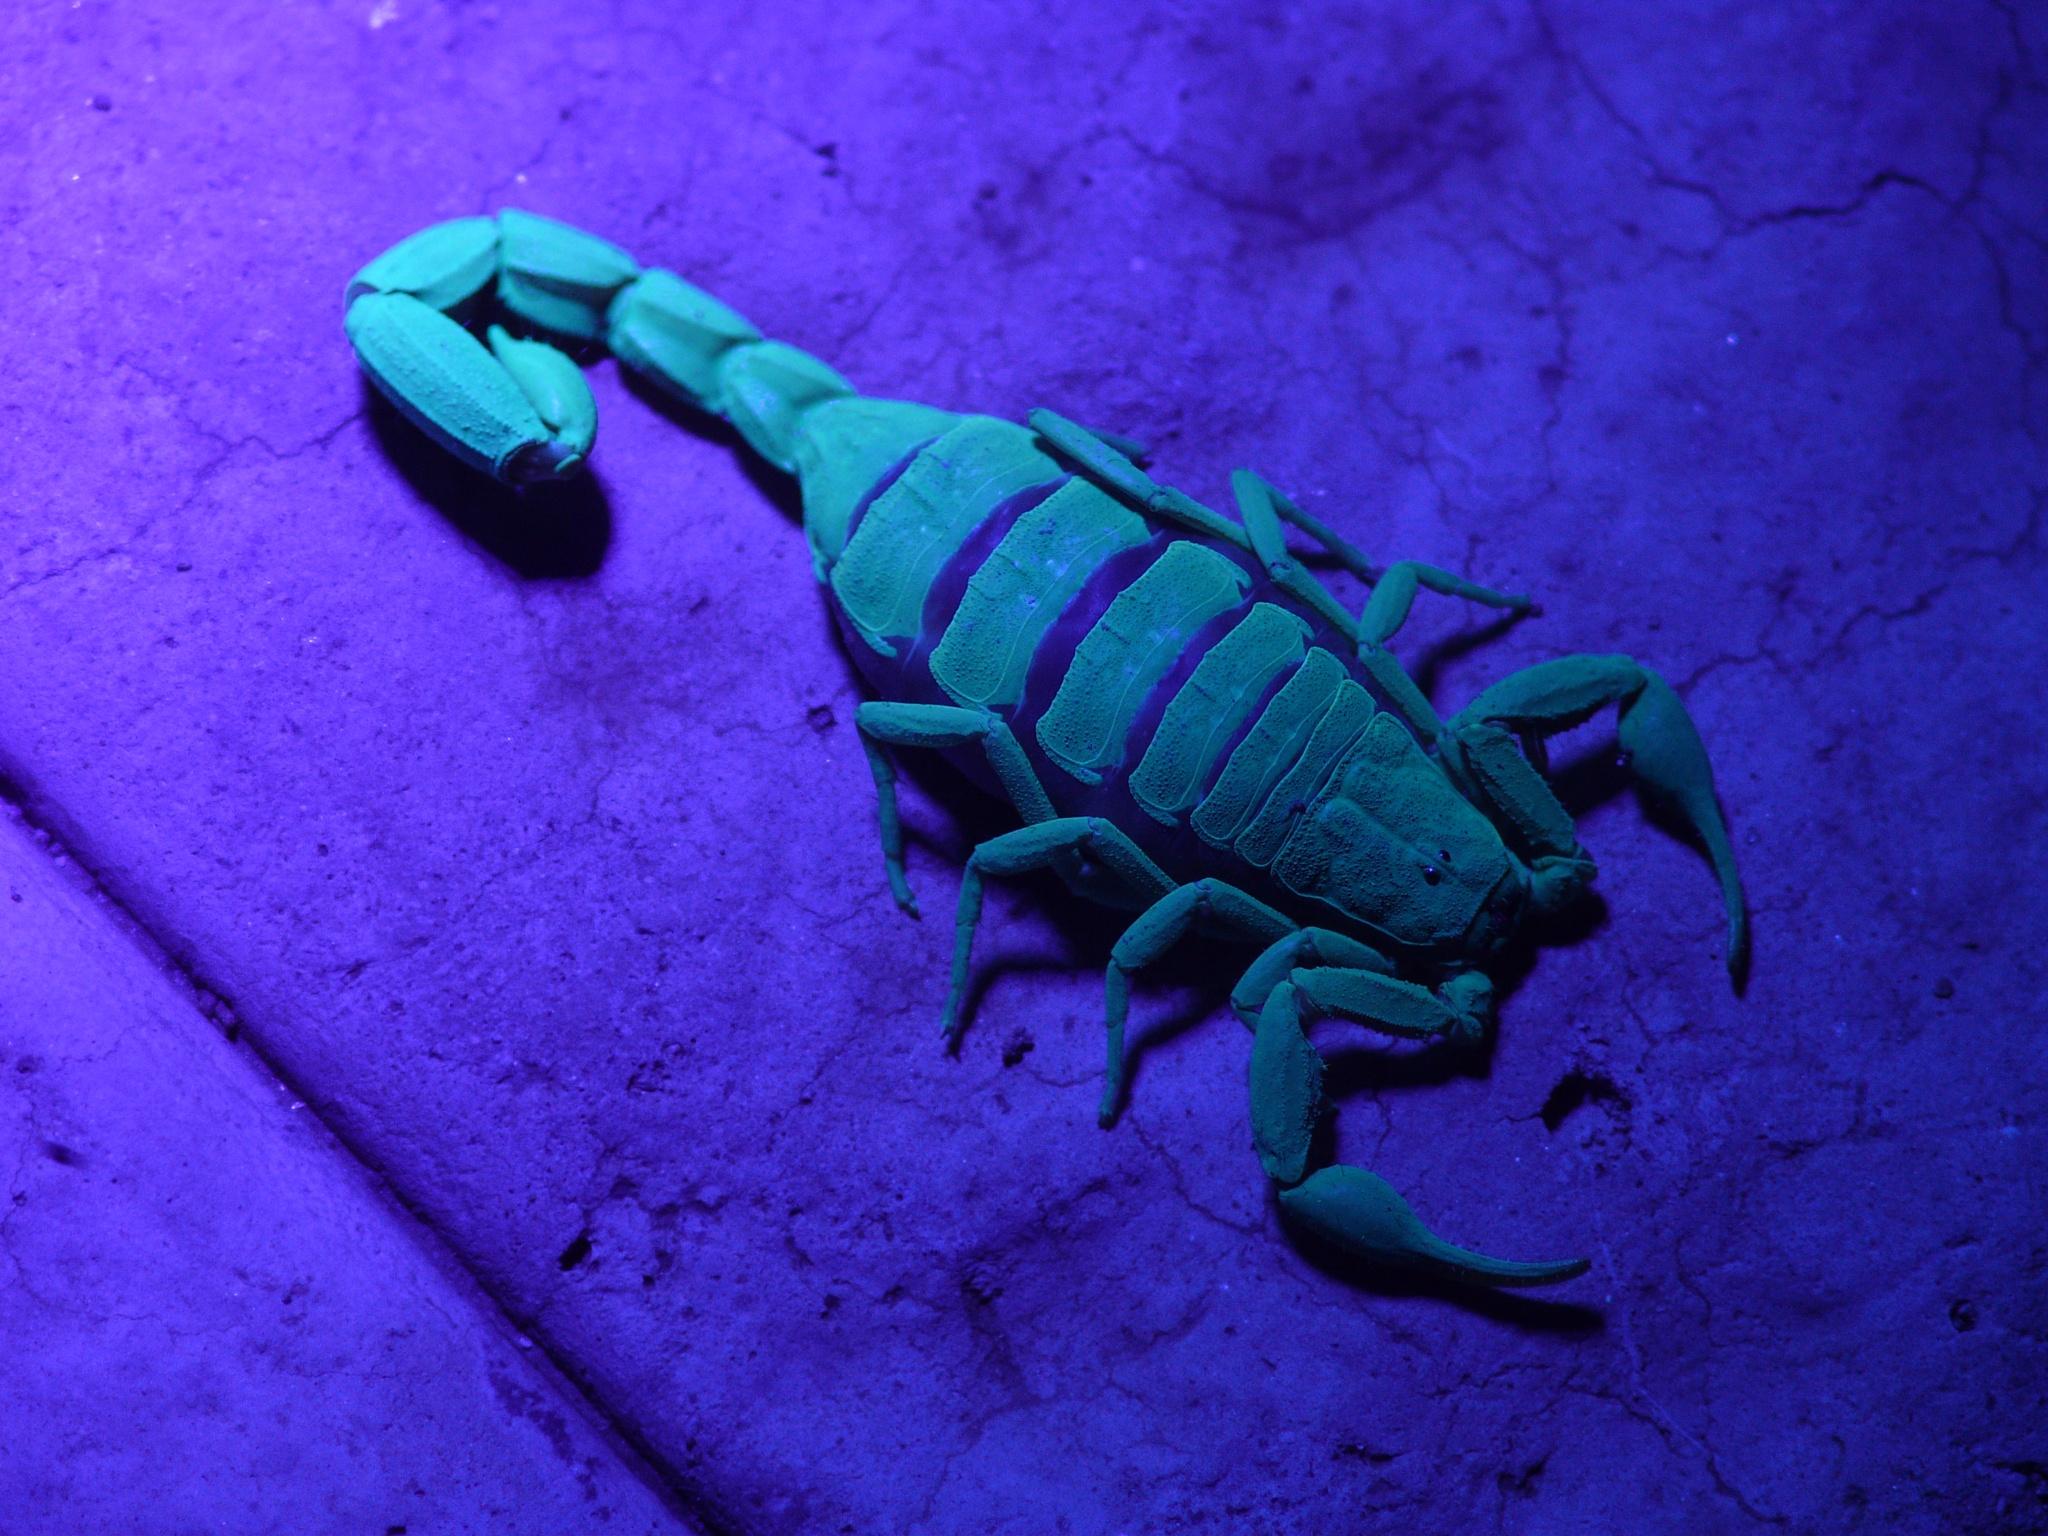 Scorpion under UV light by johannesvangraan02